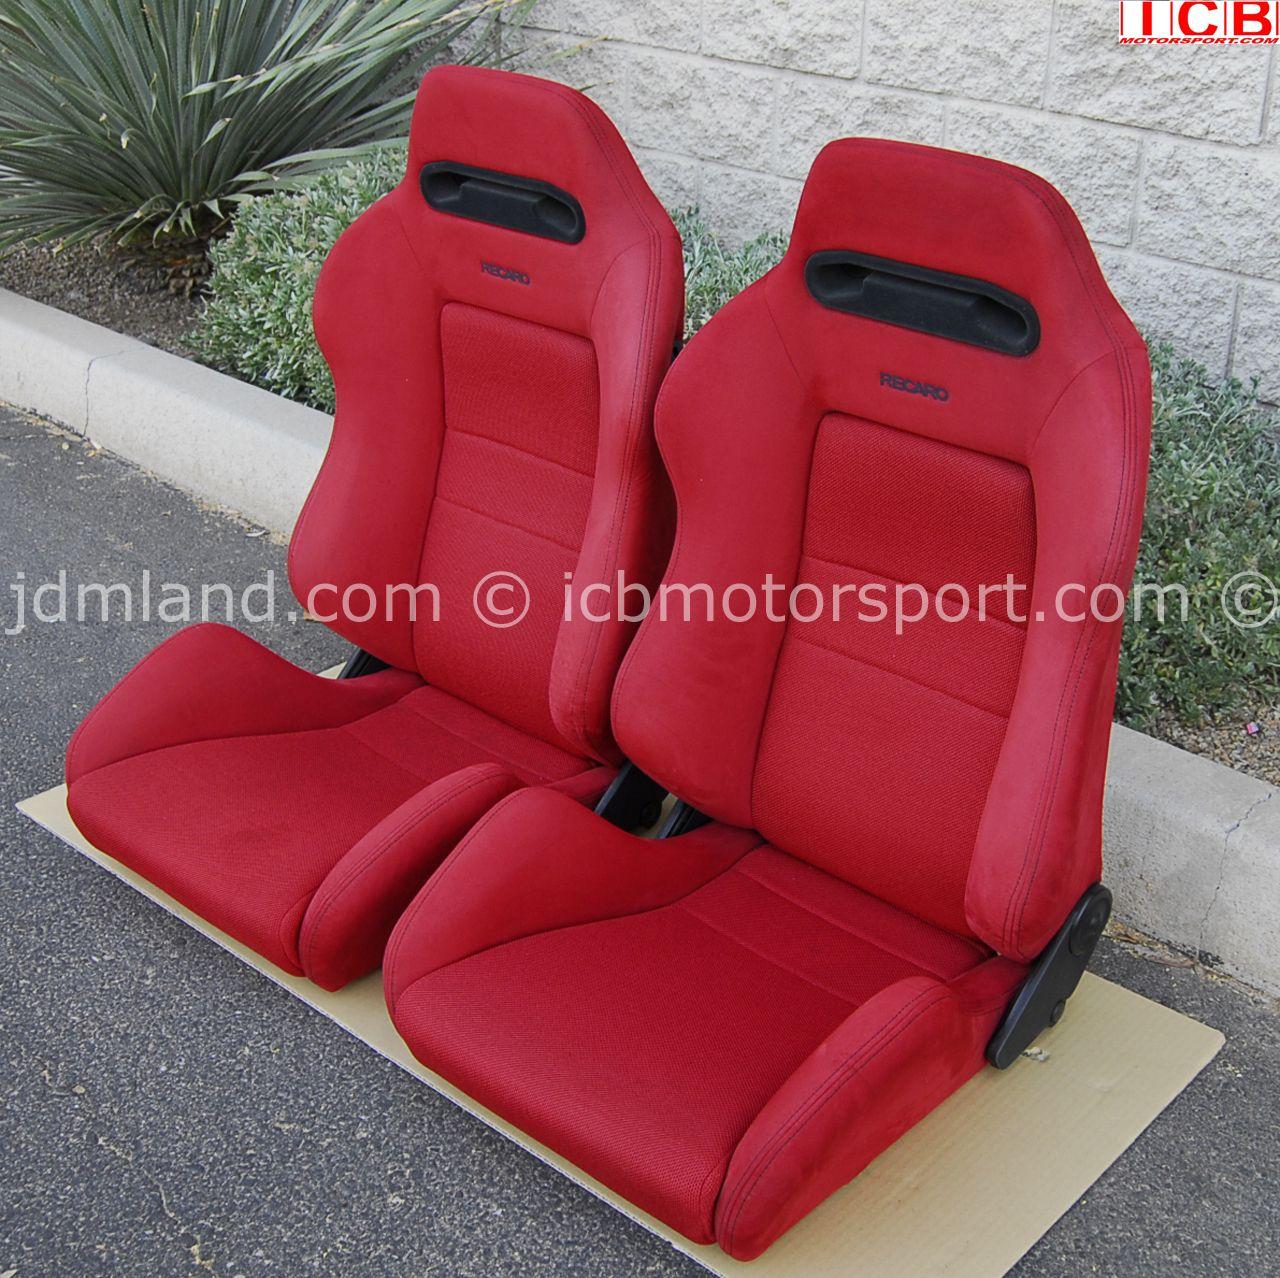 Used Honda Ek9 Civic Type R Red Recaro Seats Sold Recaro Car Seats Honda